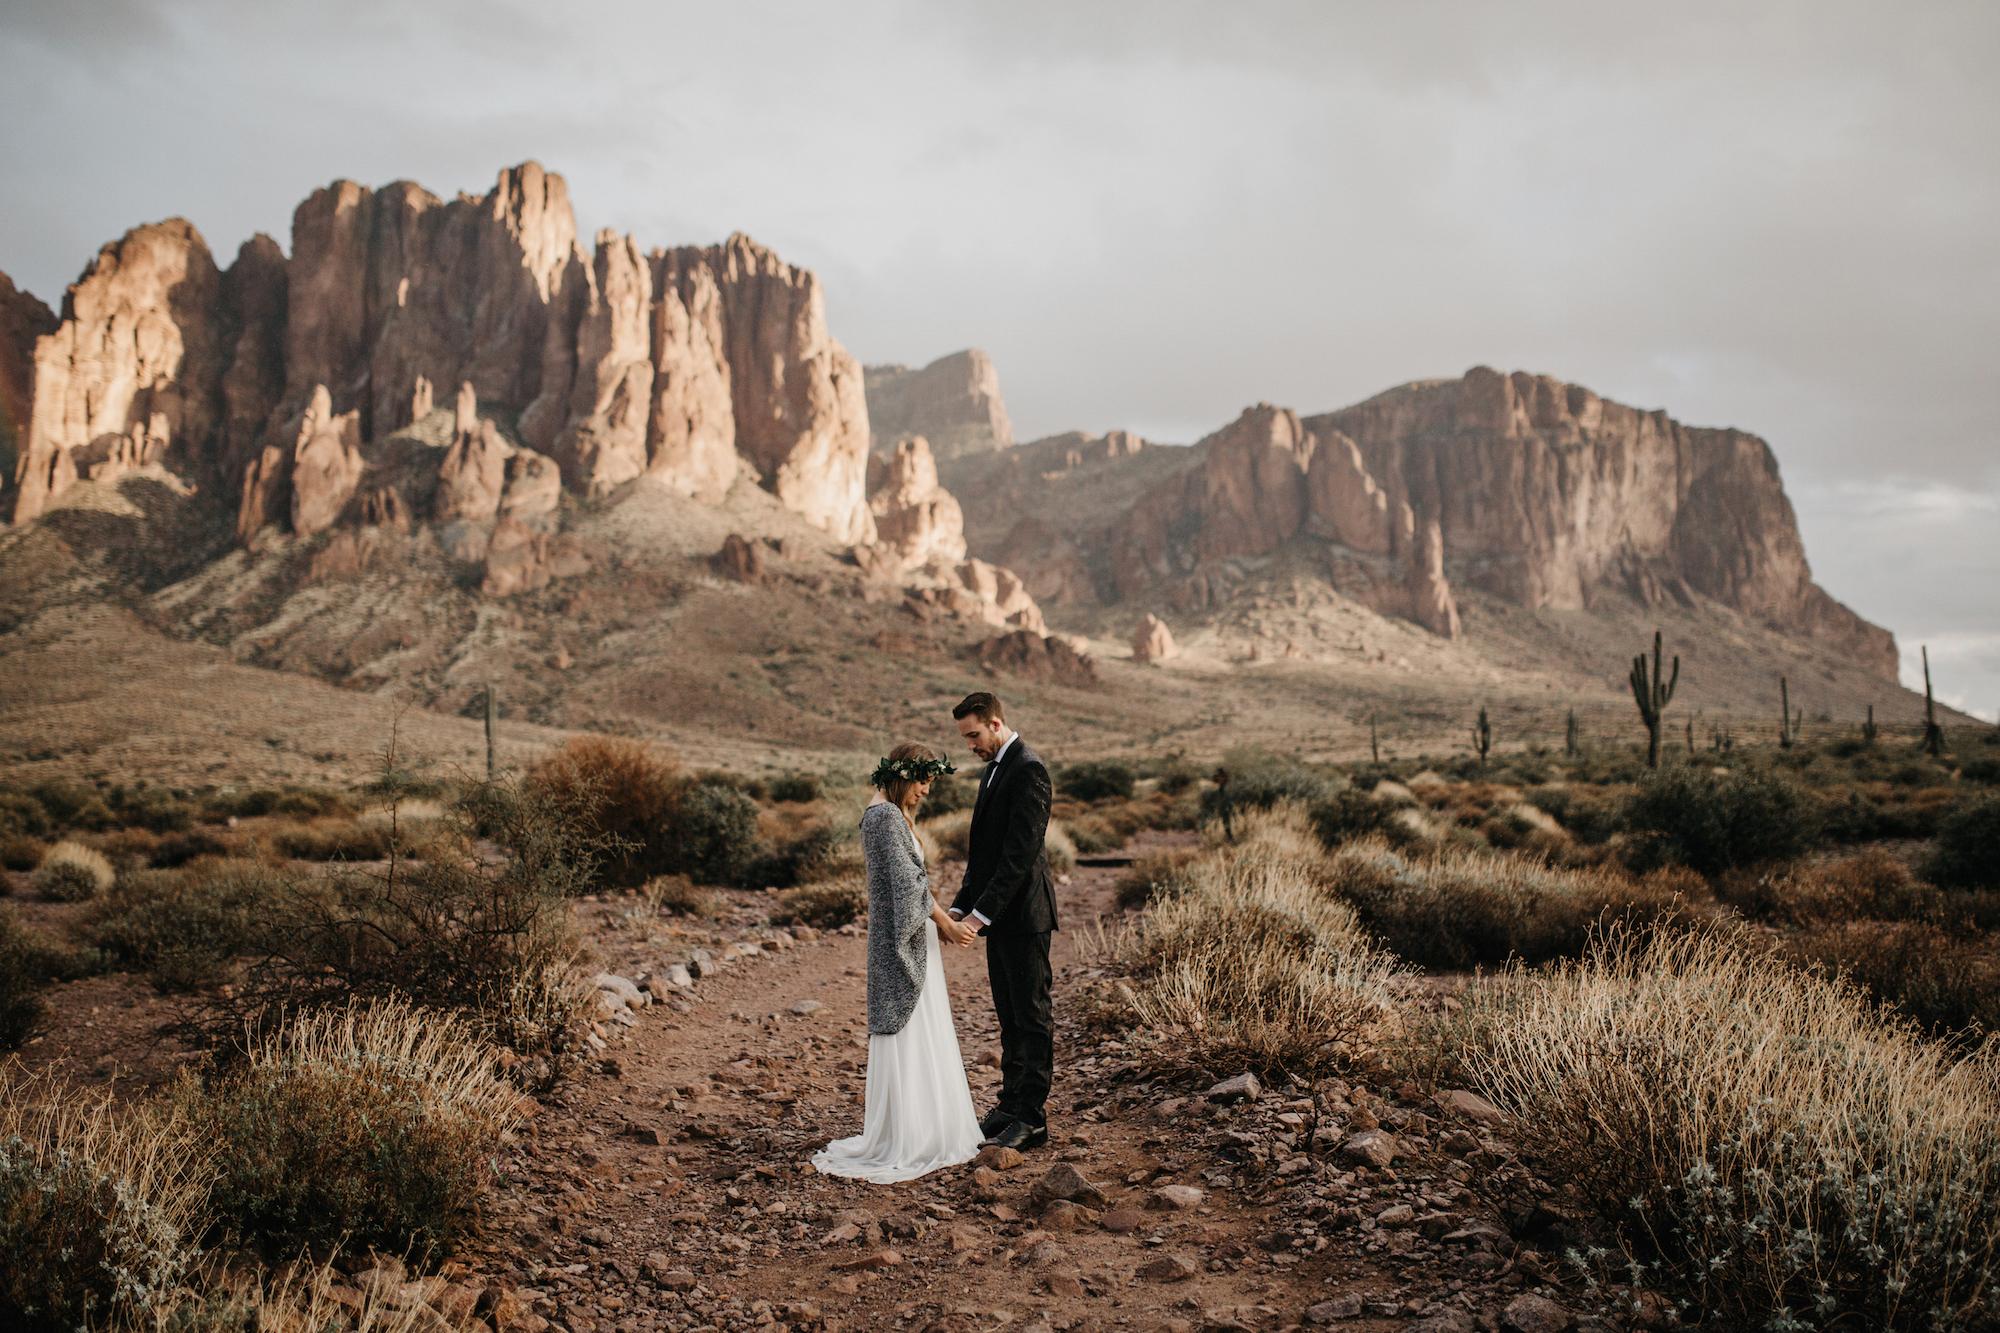 arizona - wedding - photographer778.jpg